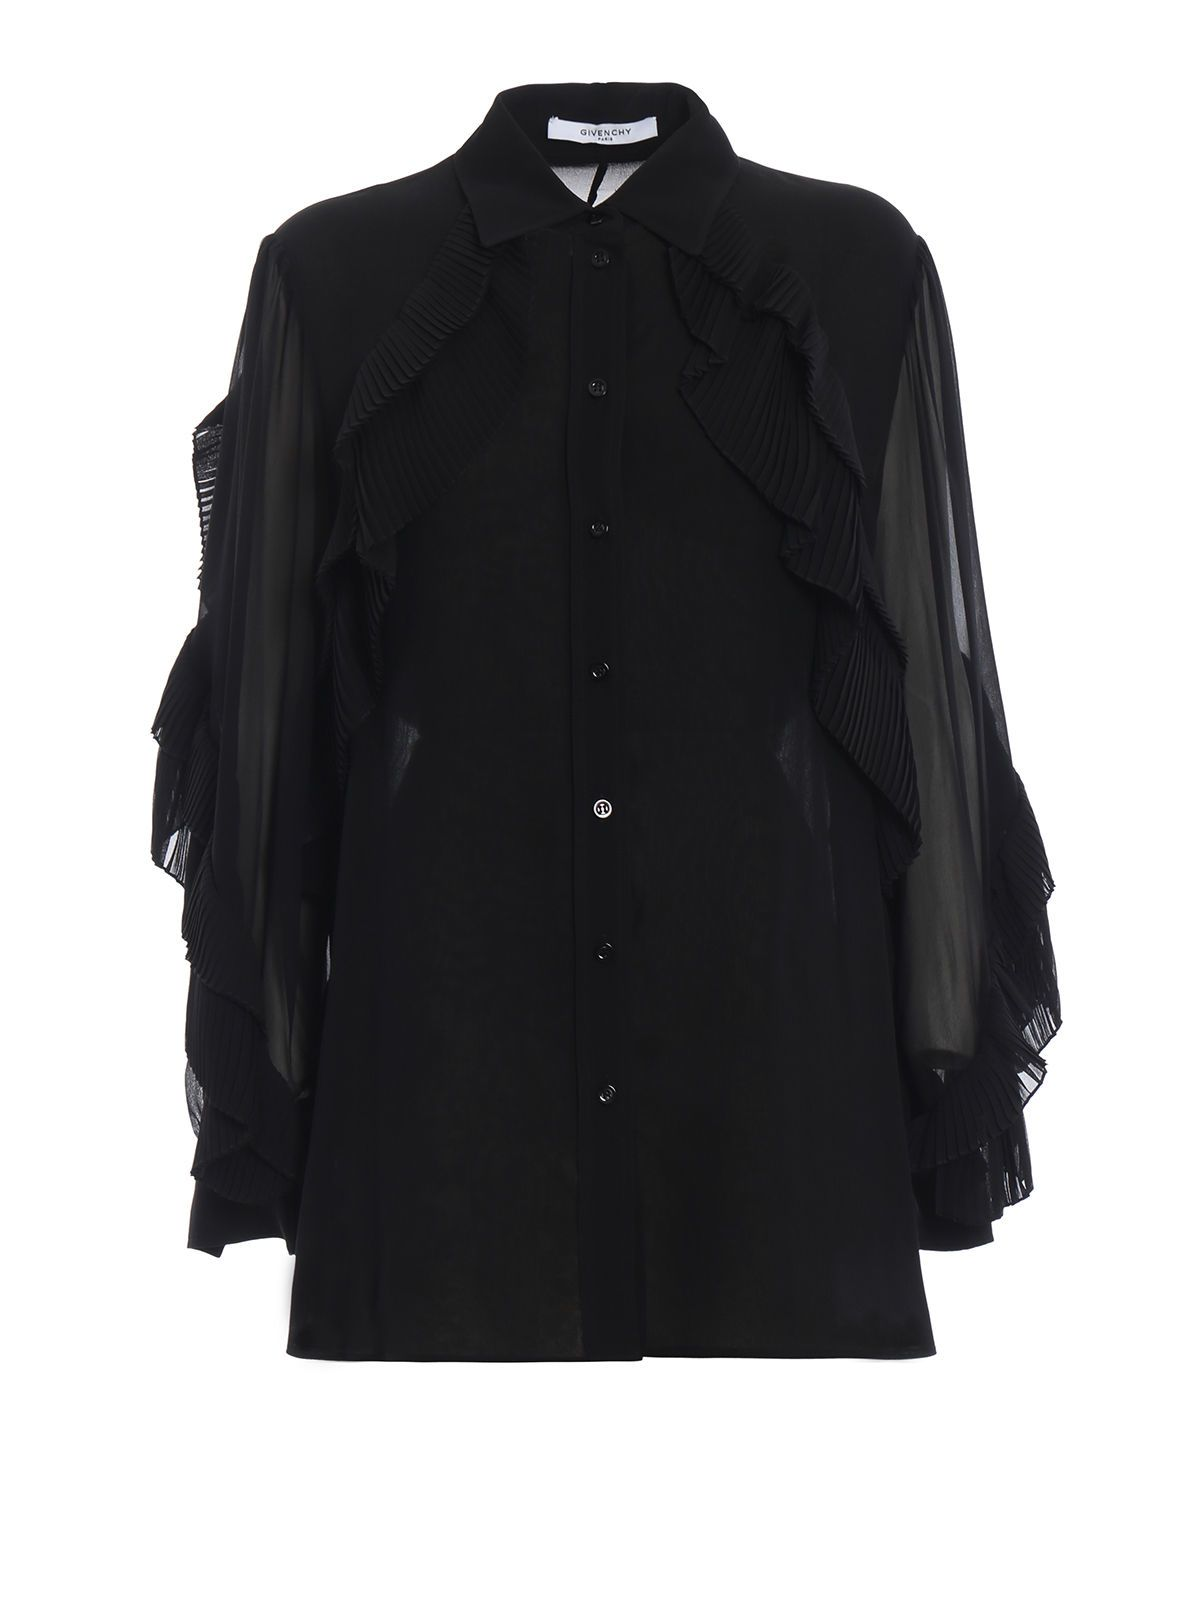 Givenchy Ruffled Blouse